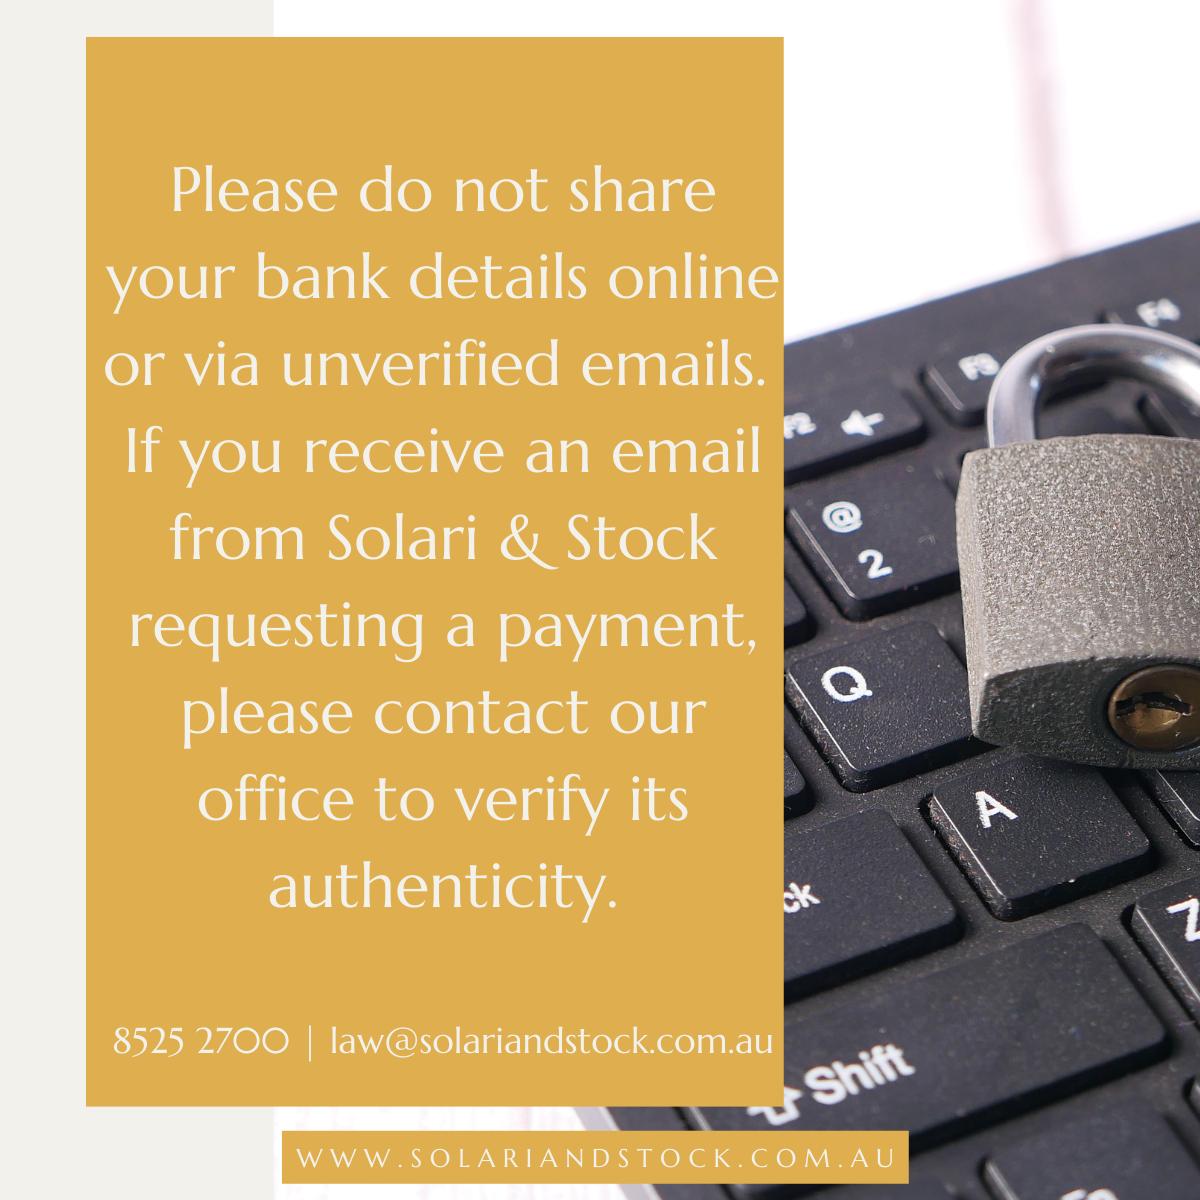 Solari and Stock security notice